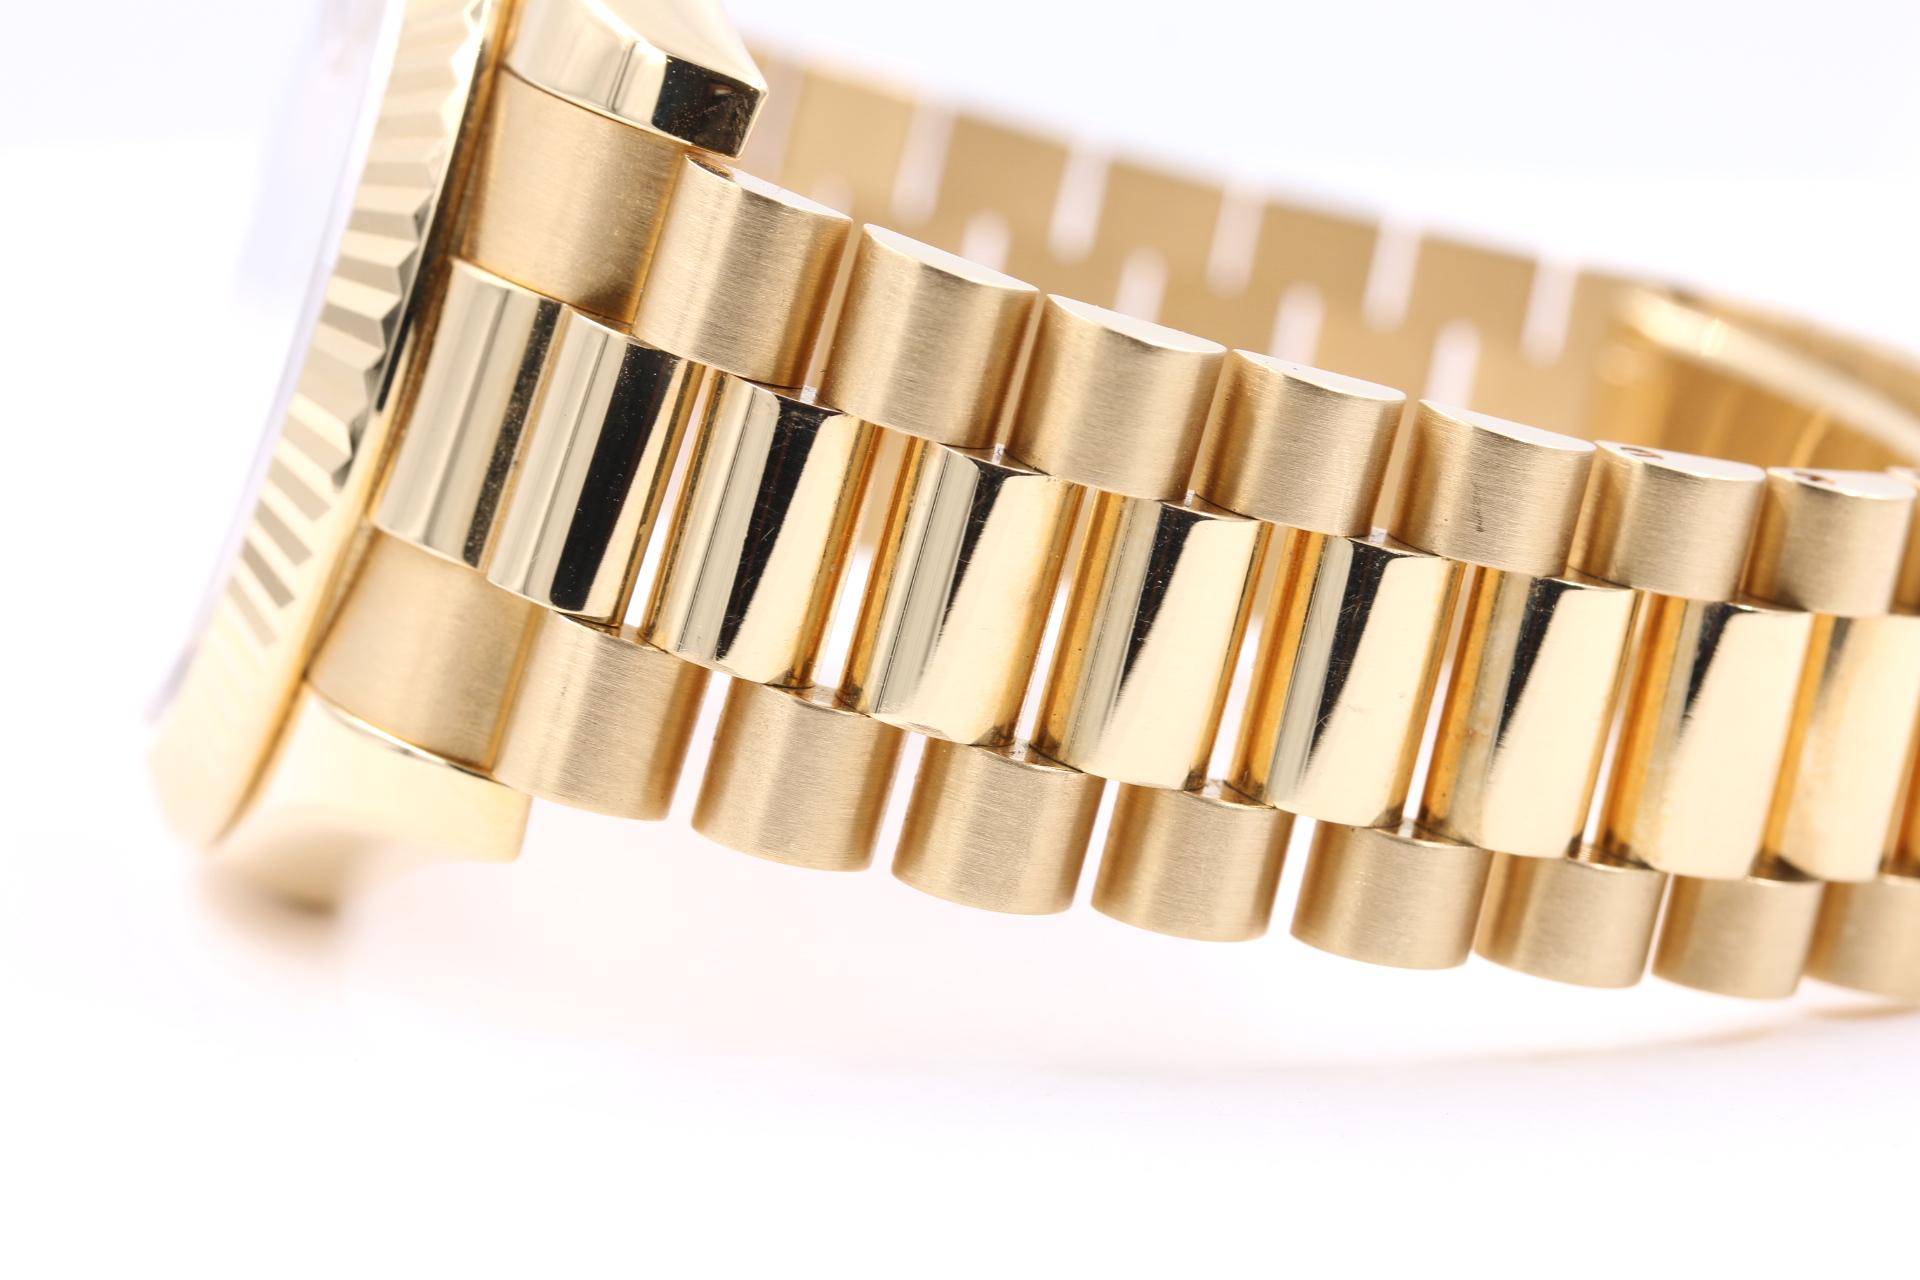 rolex watch broker orange county jeweler side view bracelet